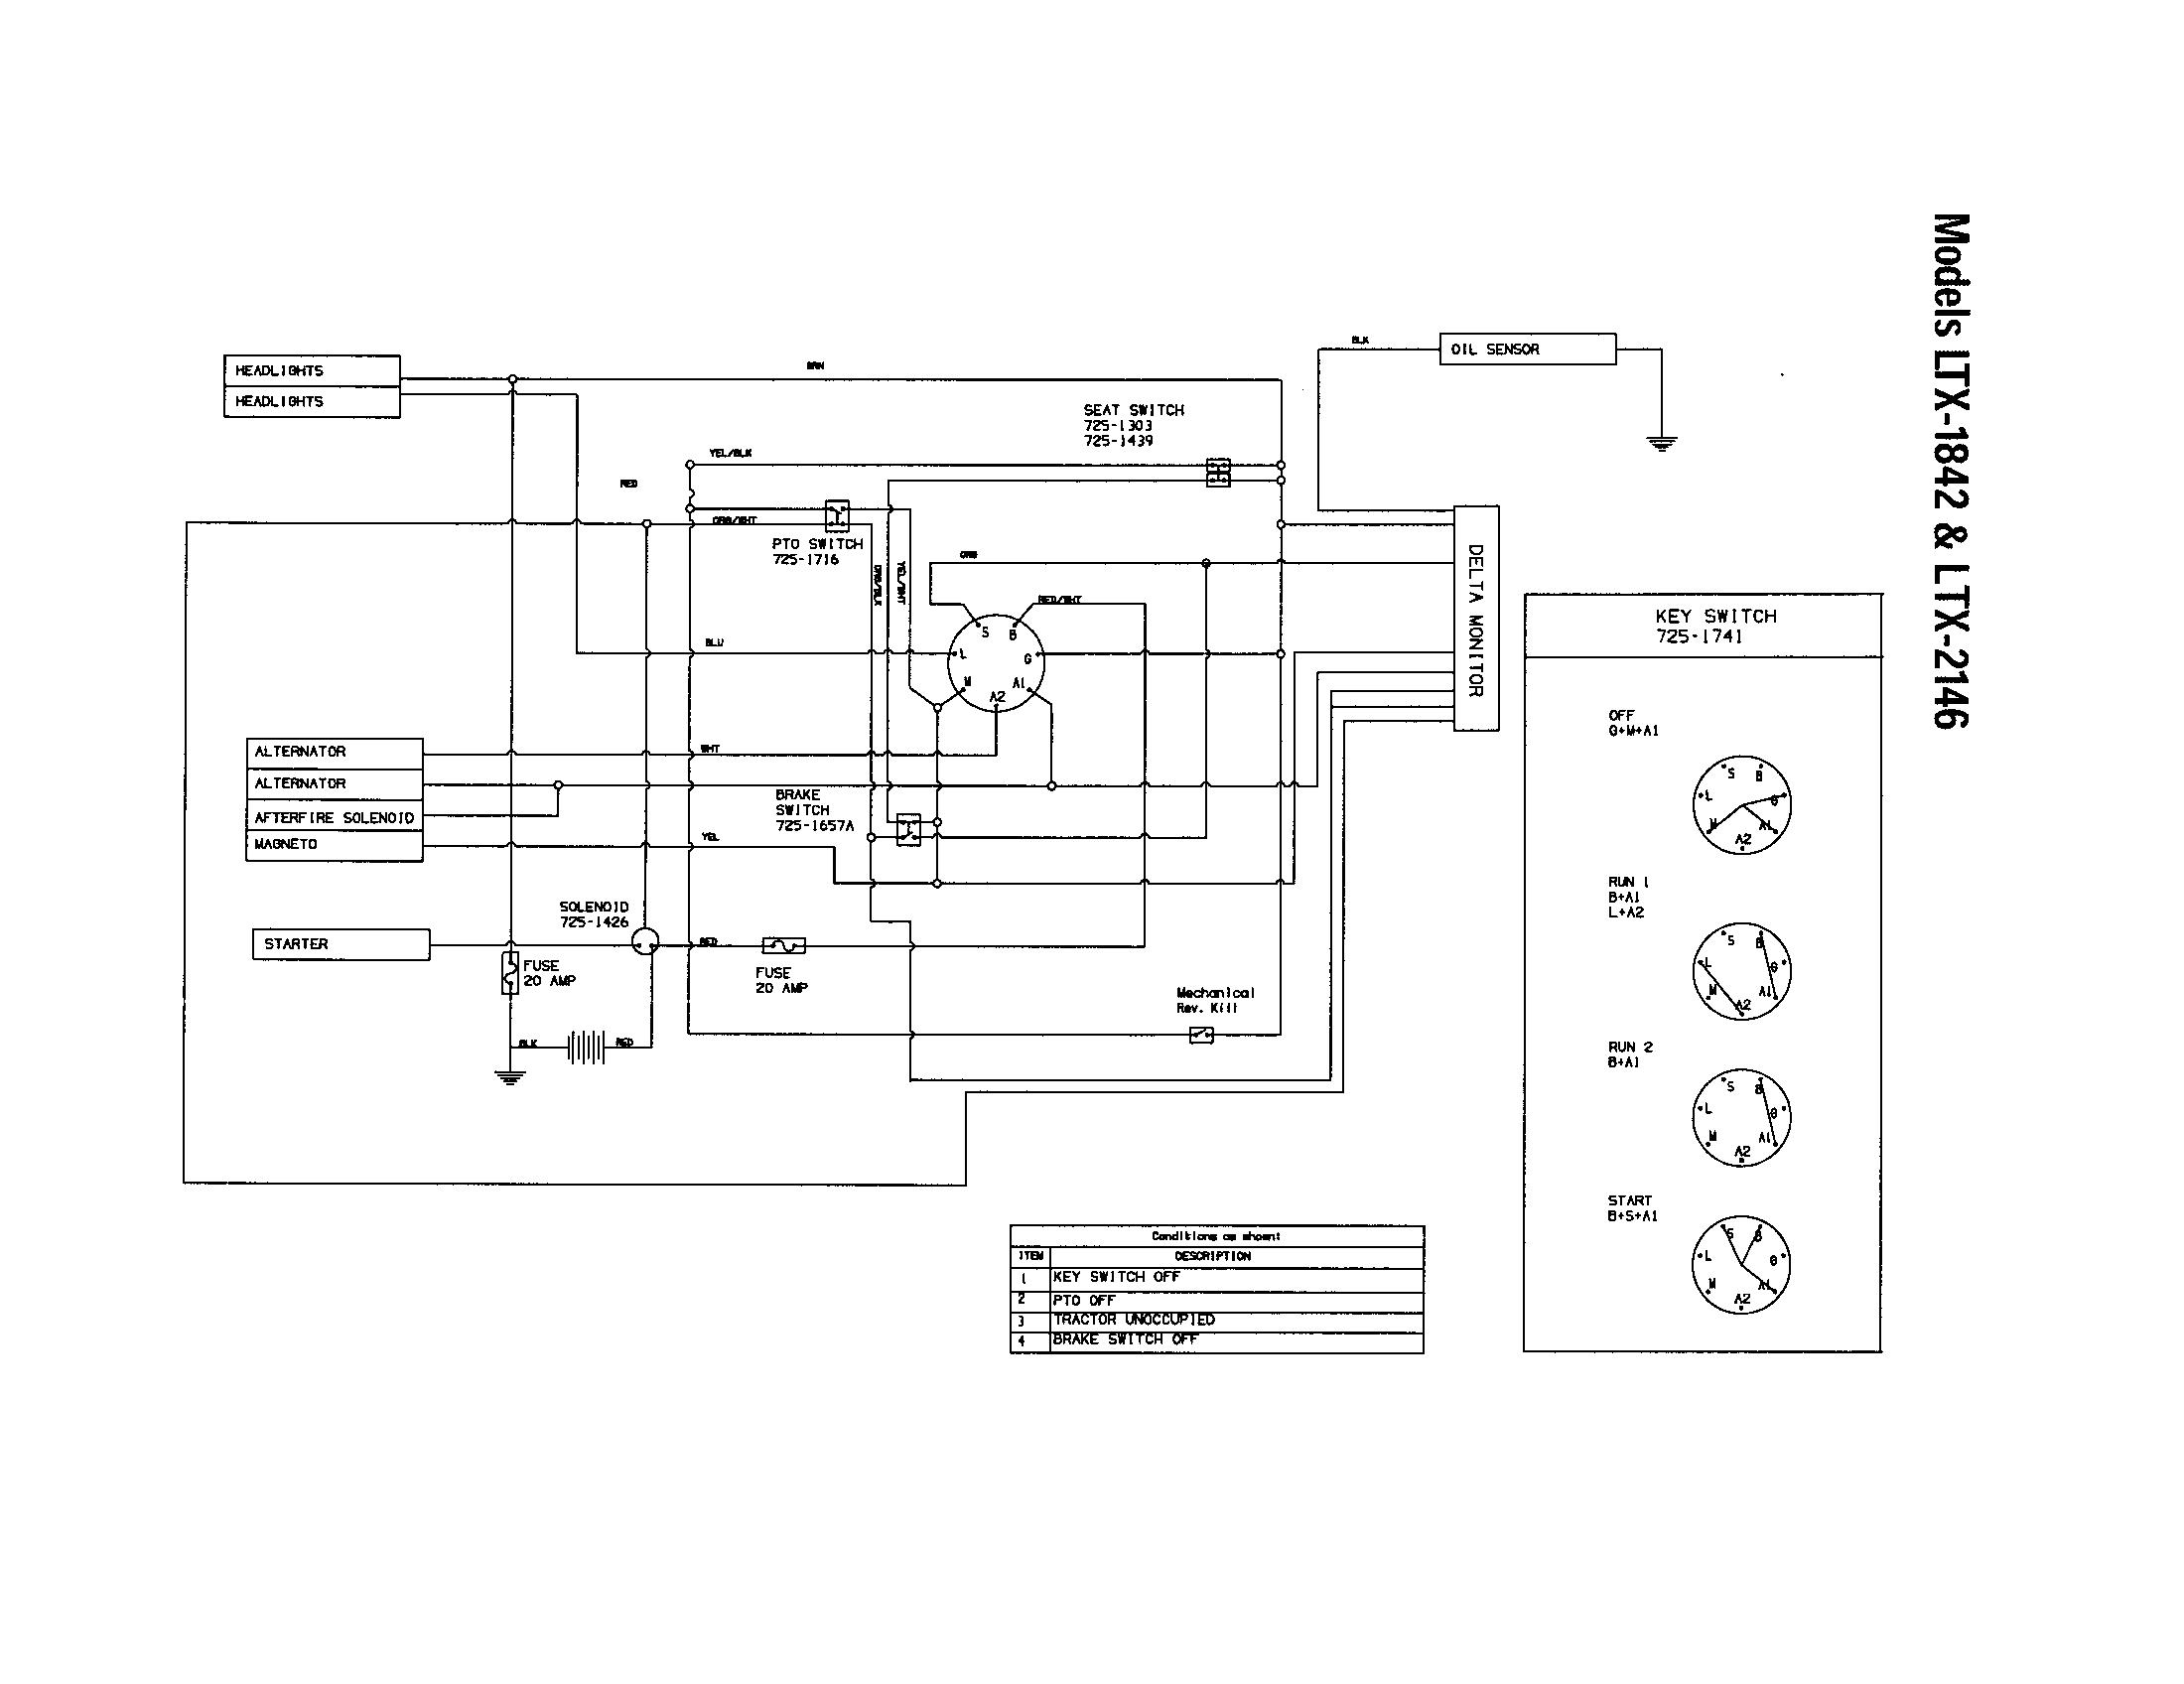 troy bilt mower wiring diagram use wiring diagram troy bilt riding lawn mower wiring diagram troy bilt pony lawn tractor wiring diagram [ 2200 x 1696 Pixel ]